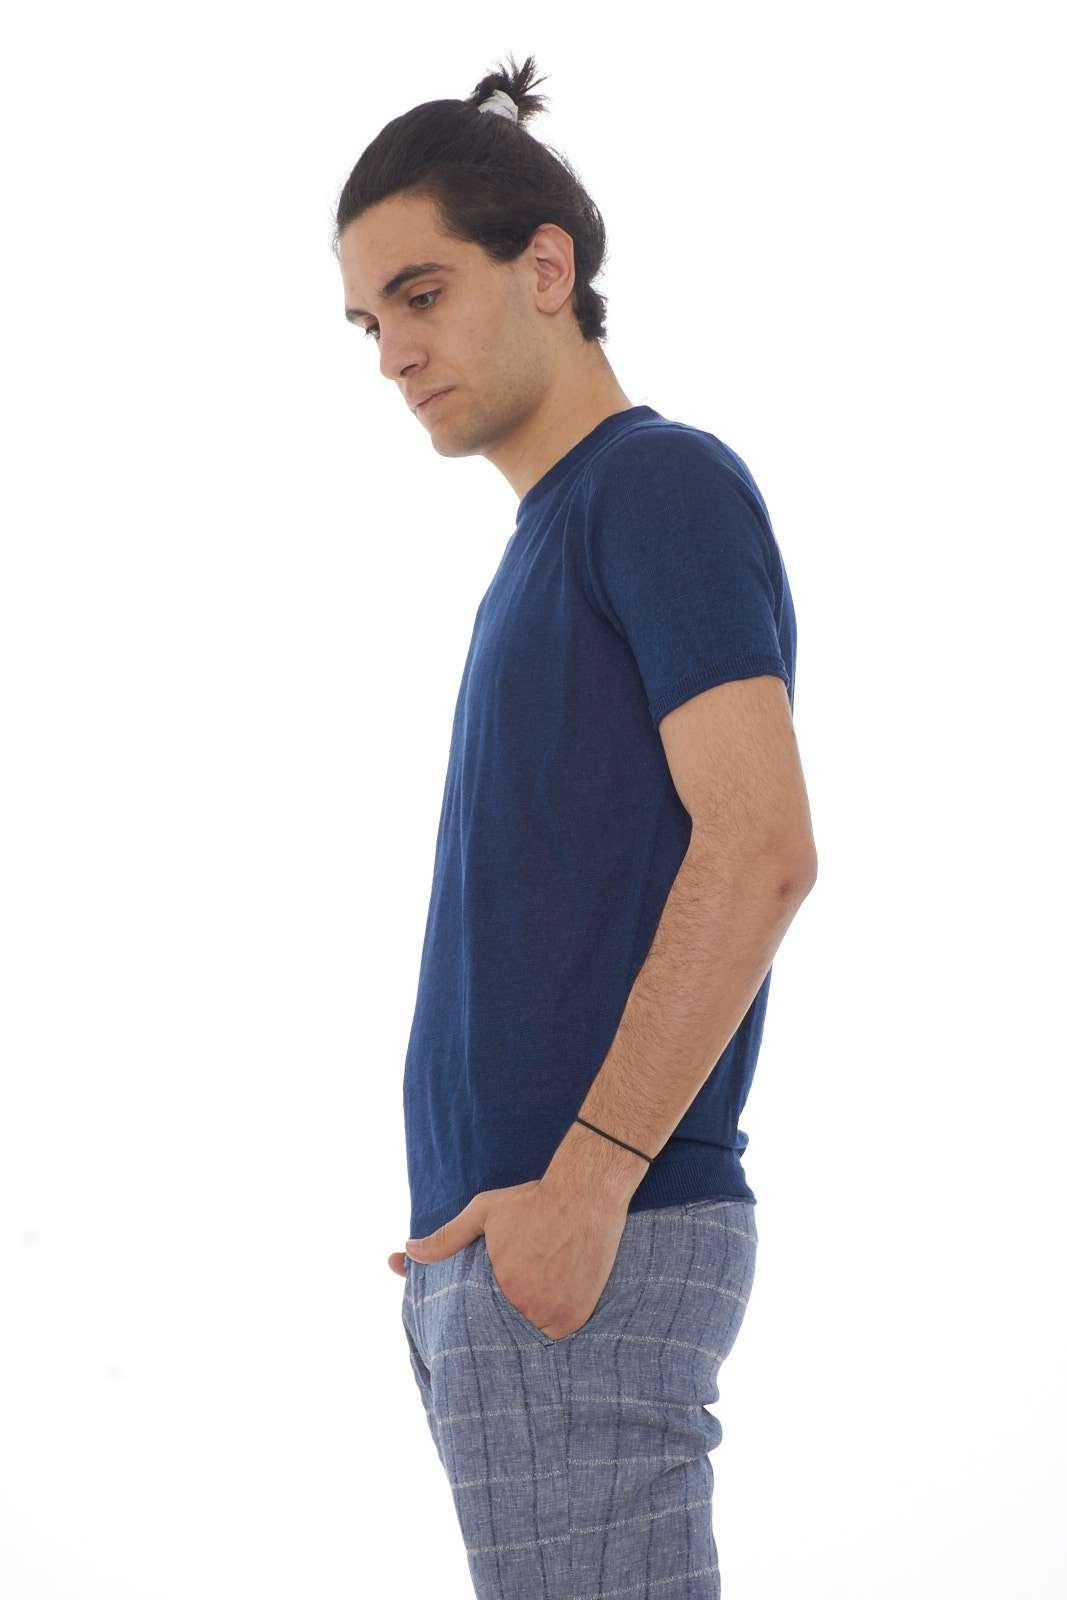 https://www.parmax.com/media/catalog/product/a/i/PE-outlet_parmax-t-shirt-uomo-Kangra-9EK7013-B.jpg